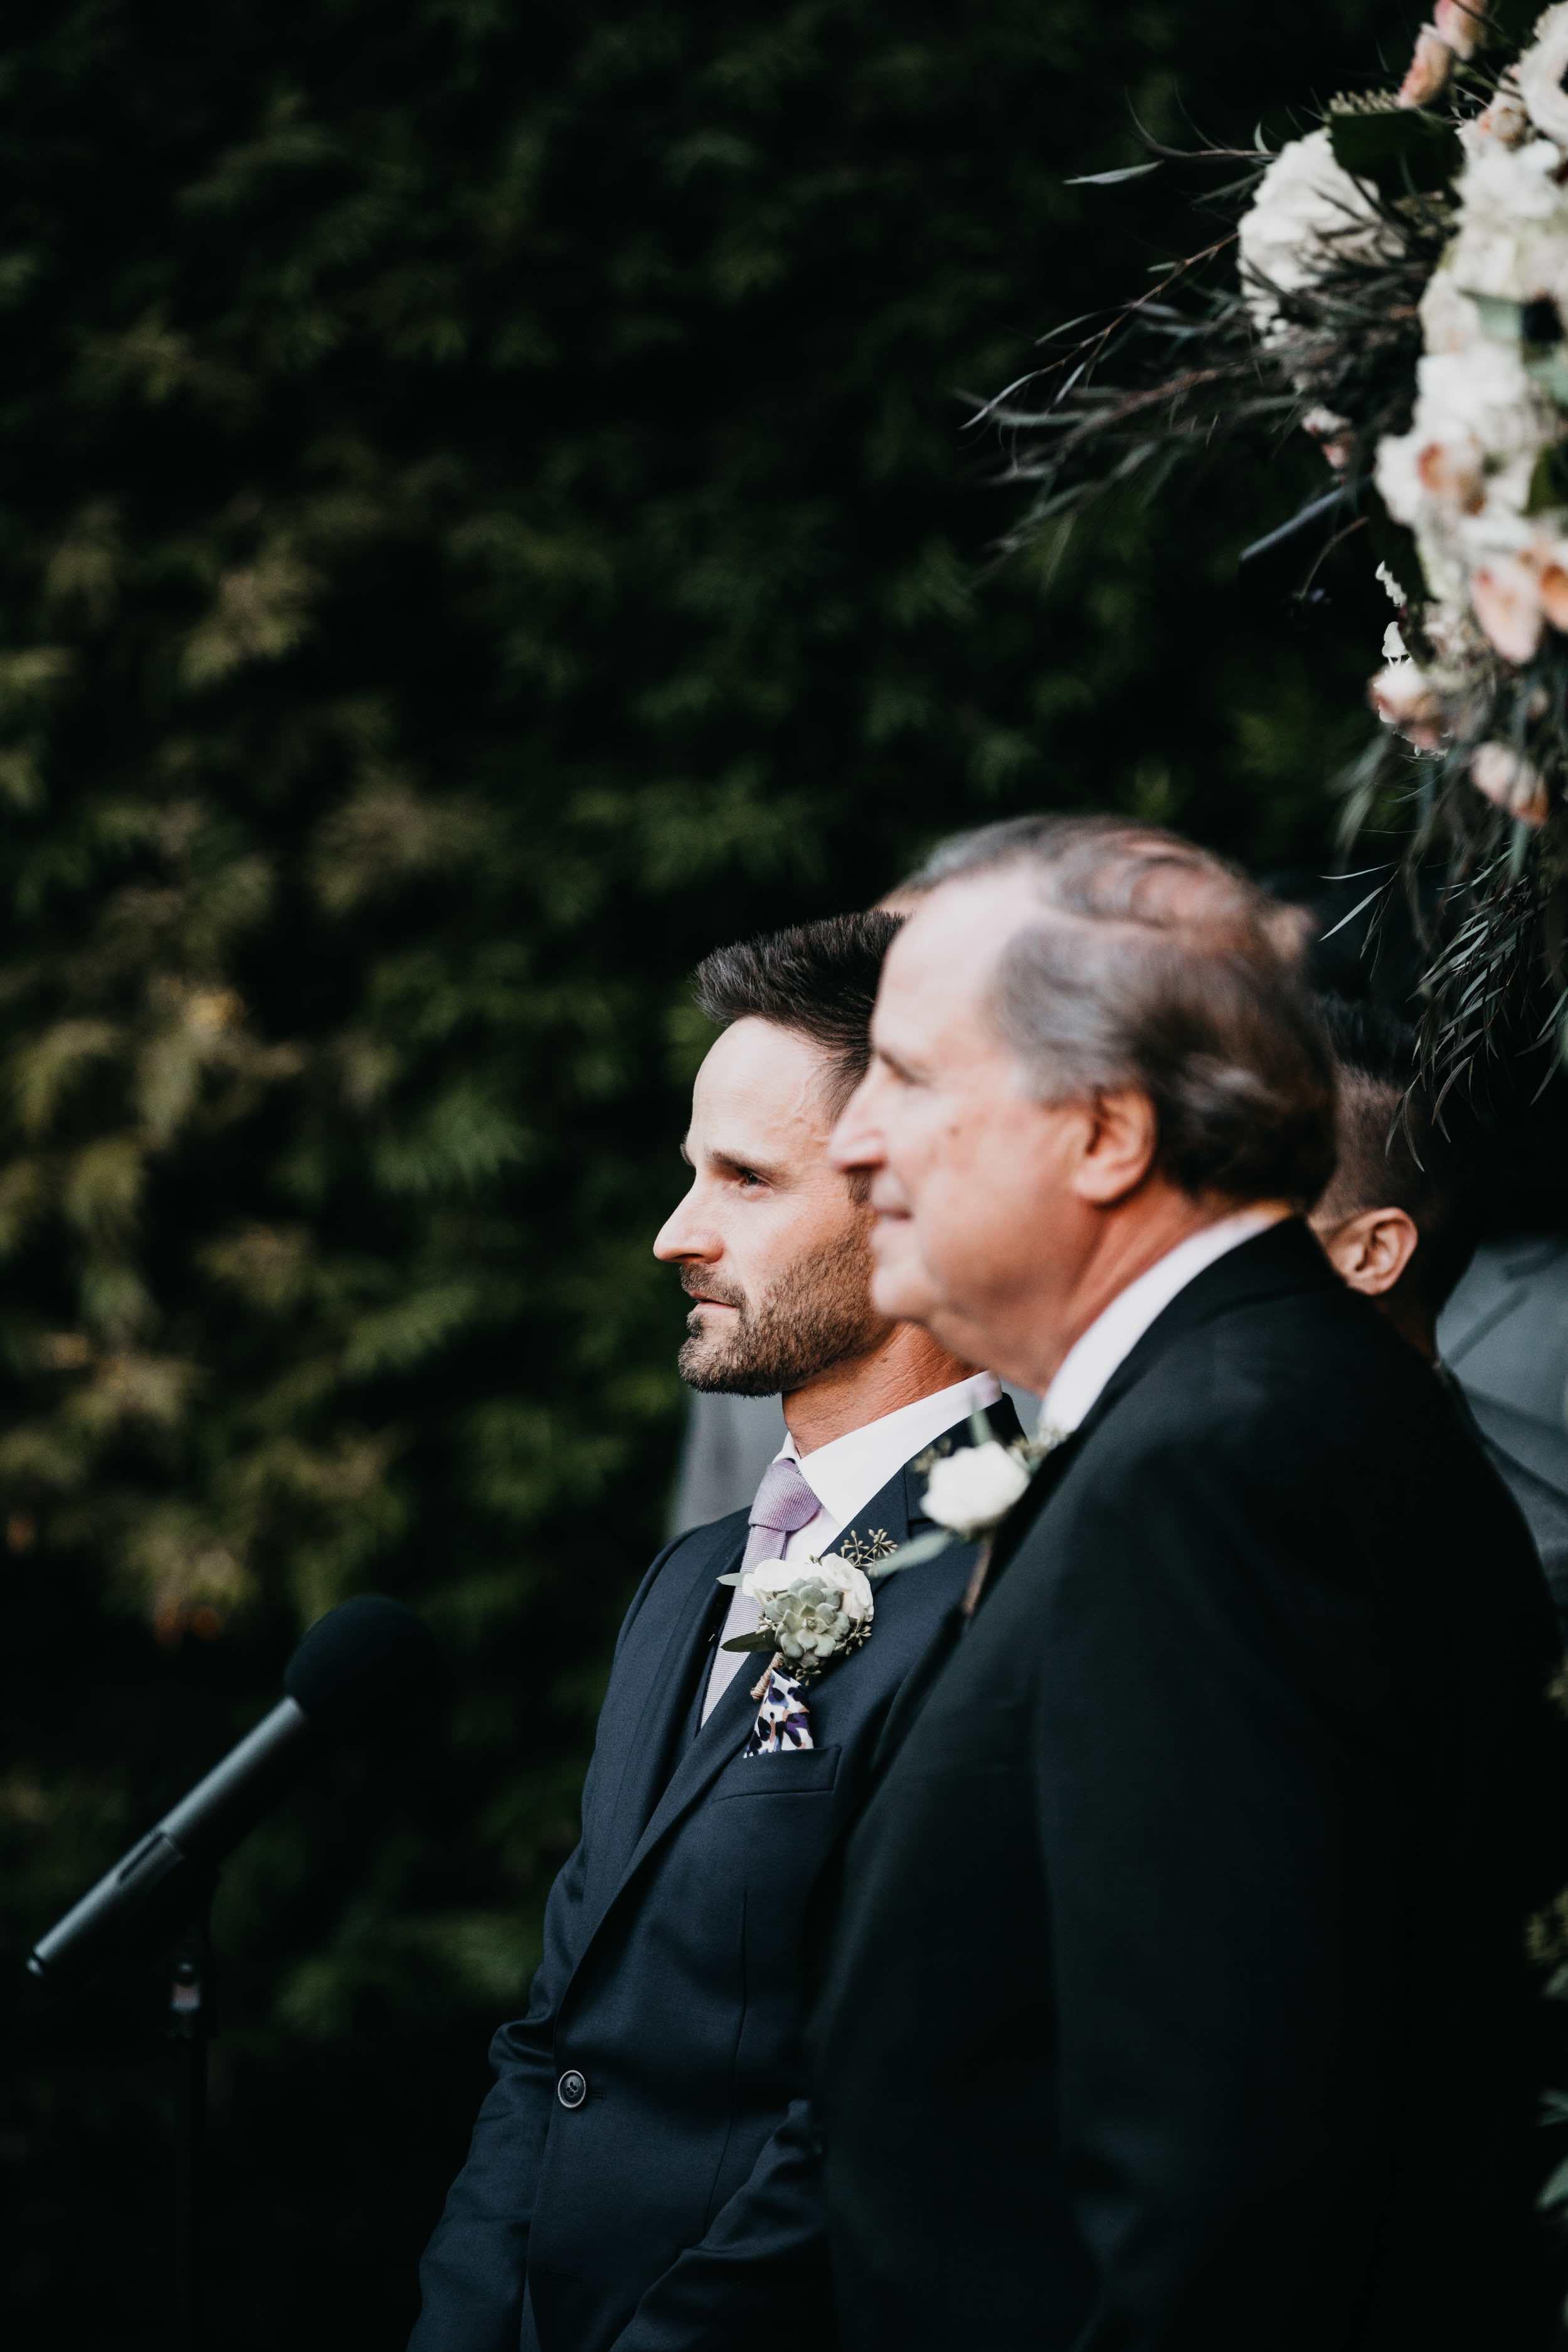 Laura&Don_Ceremony70.jpeg